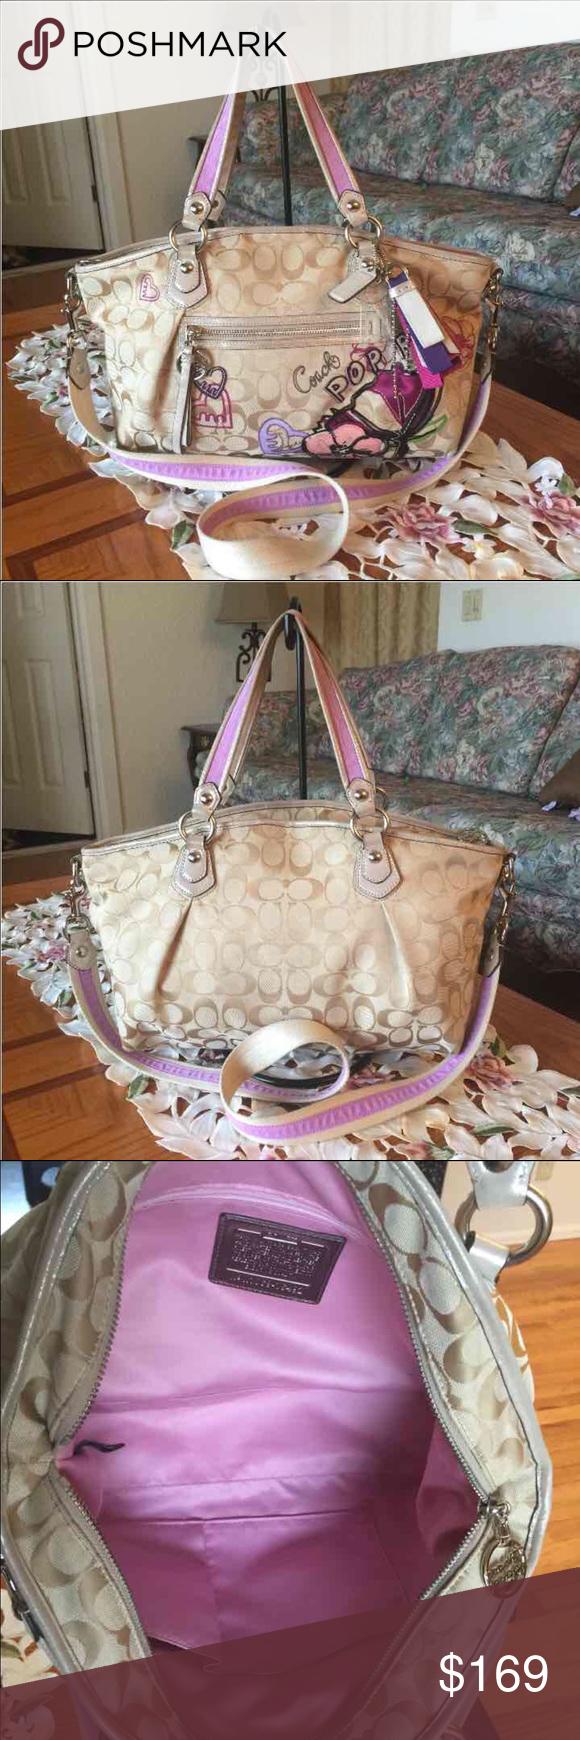 Rare coach poppy satchel Rare coach poppy purse,large,tan/lavender ,silvertone hardware,it has normal wear from used,smoke/pet free Coach Bags Satchels